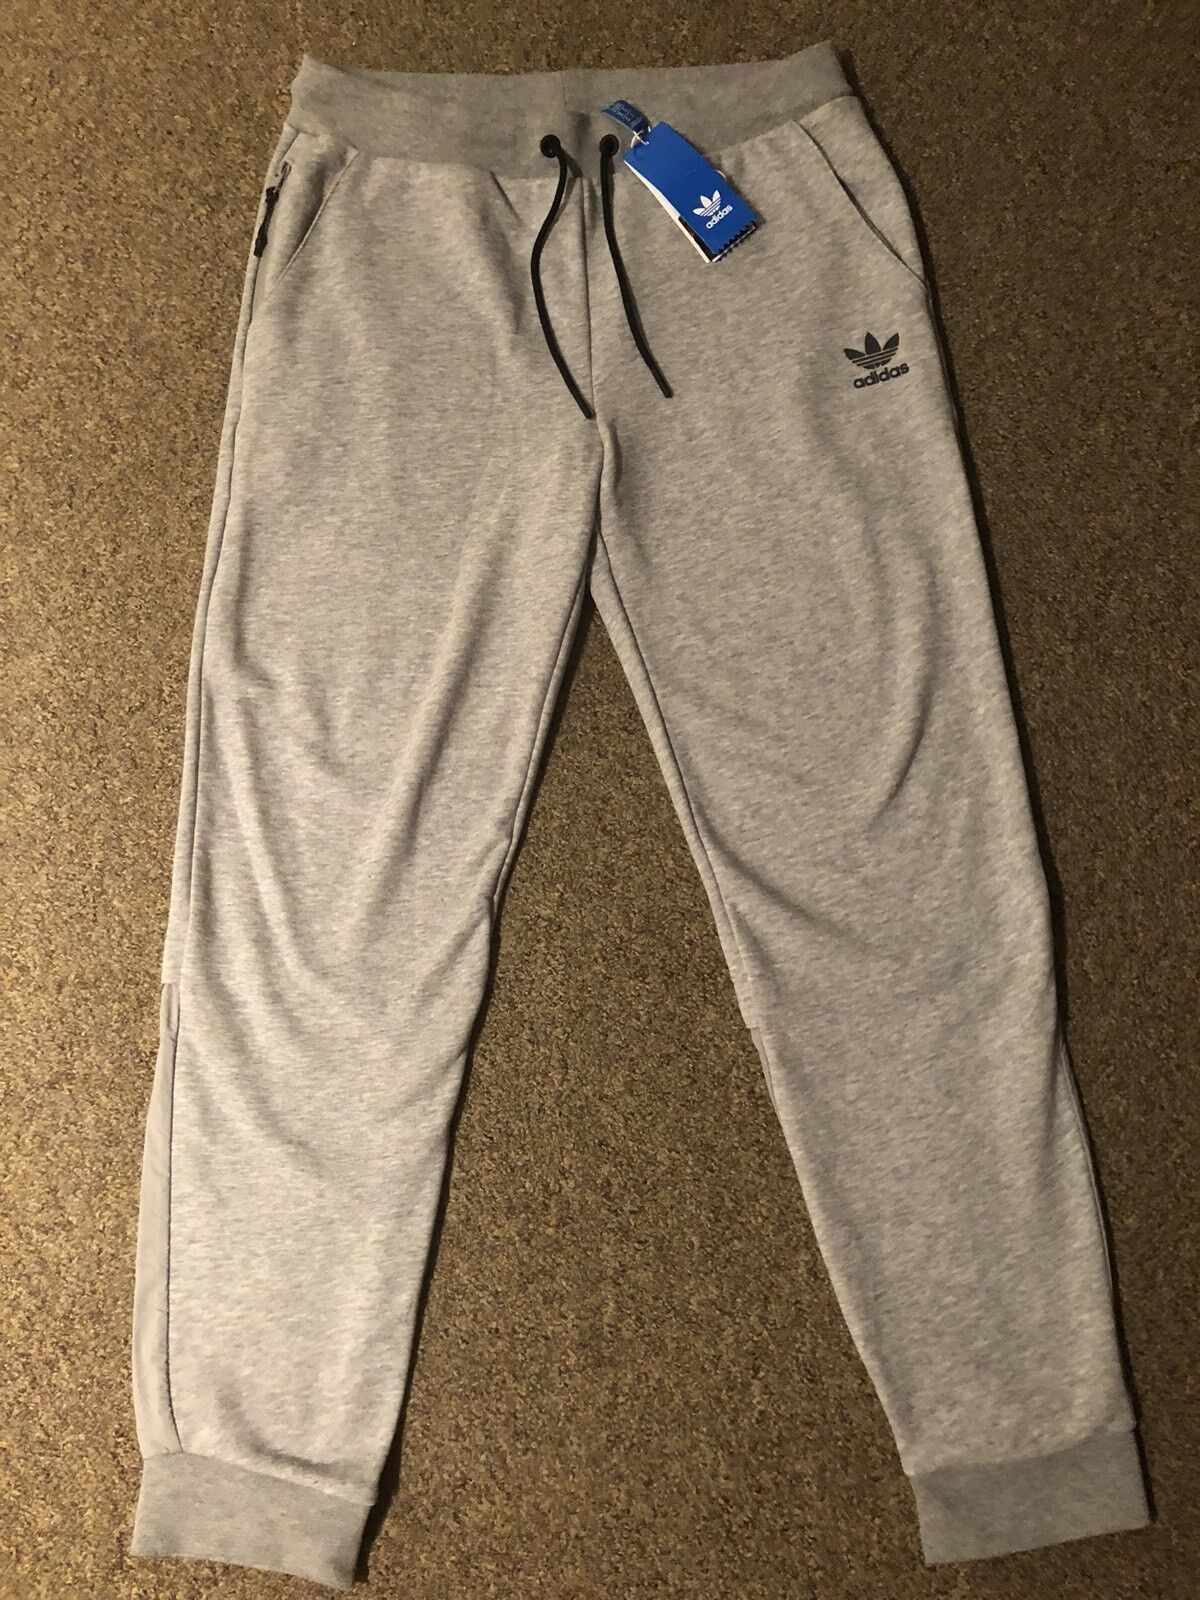 574fc74fea523f Pants Men s Size Medium Originals Adidas nyywvb17567-Activewear ...